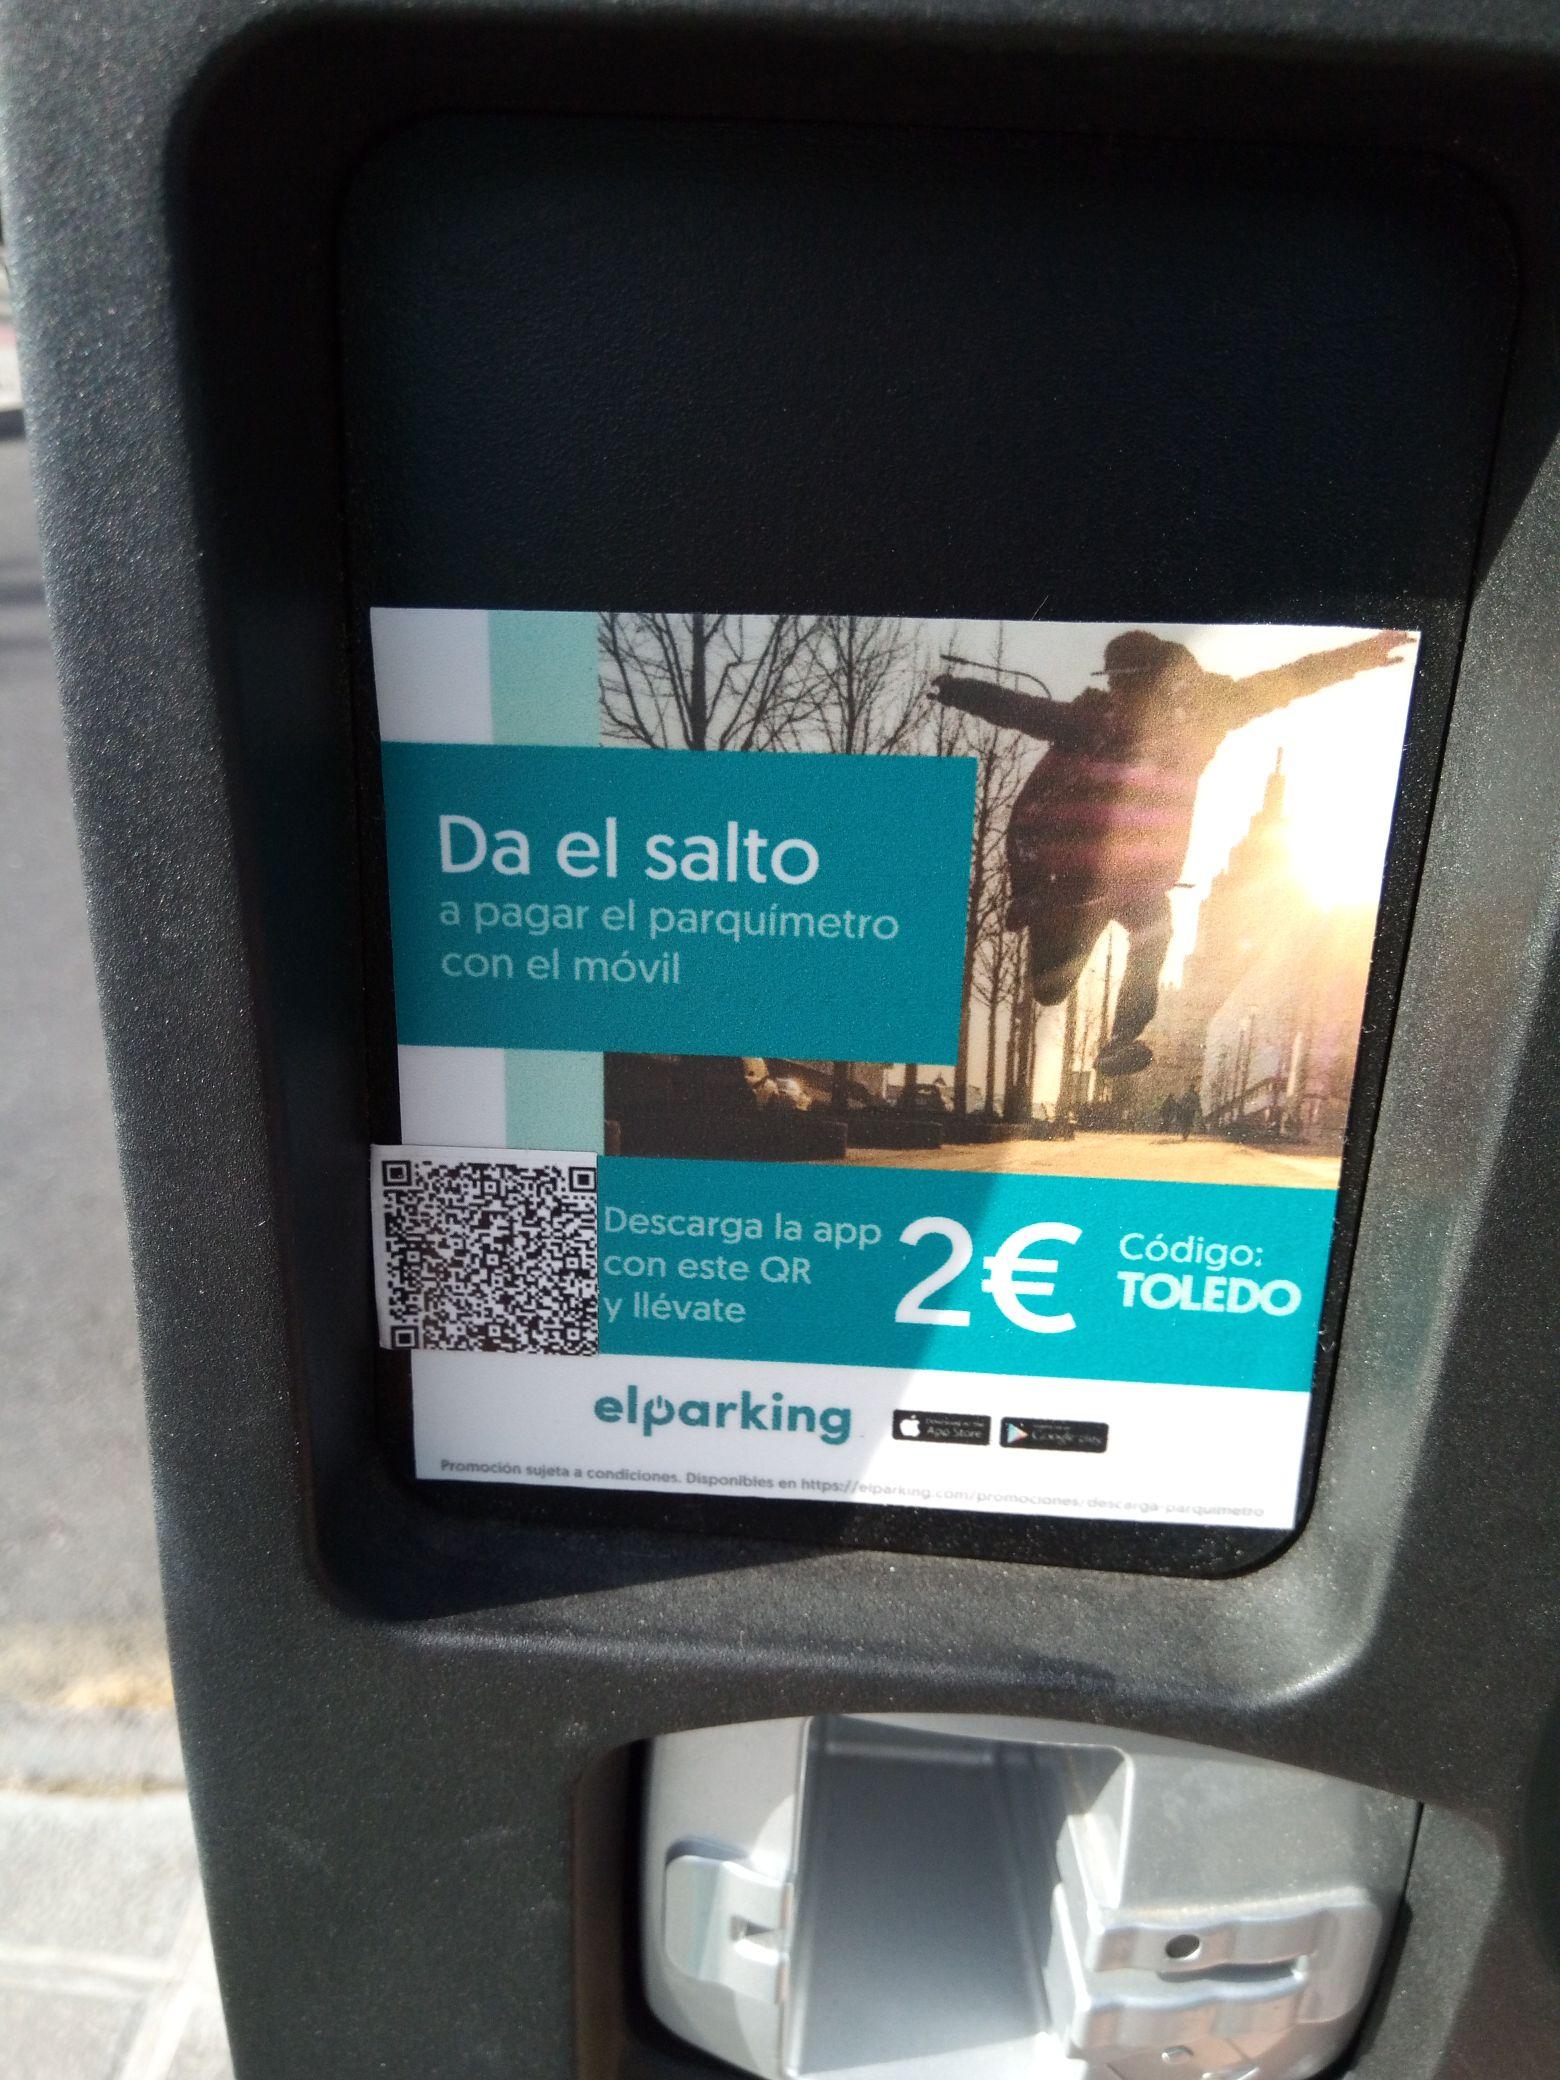 2€ gratis para aparcar en Toledo